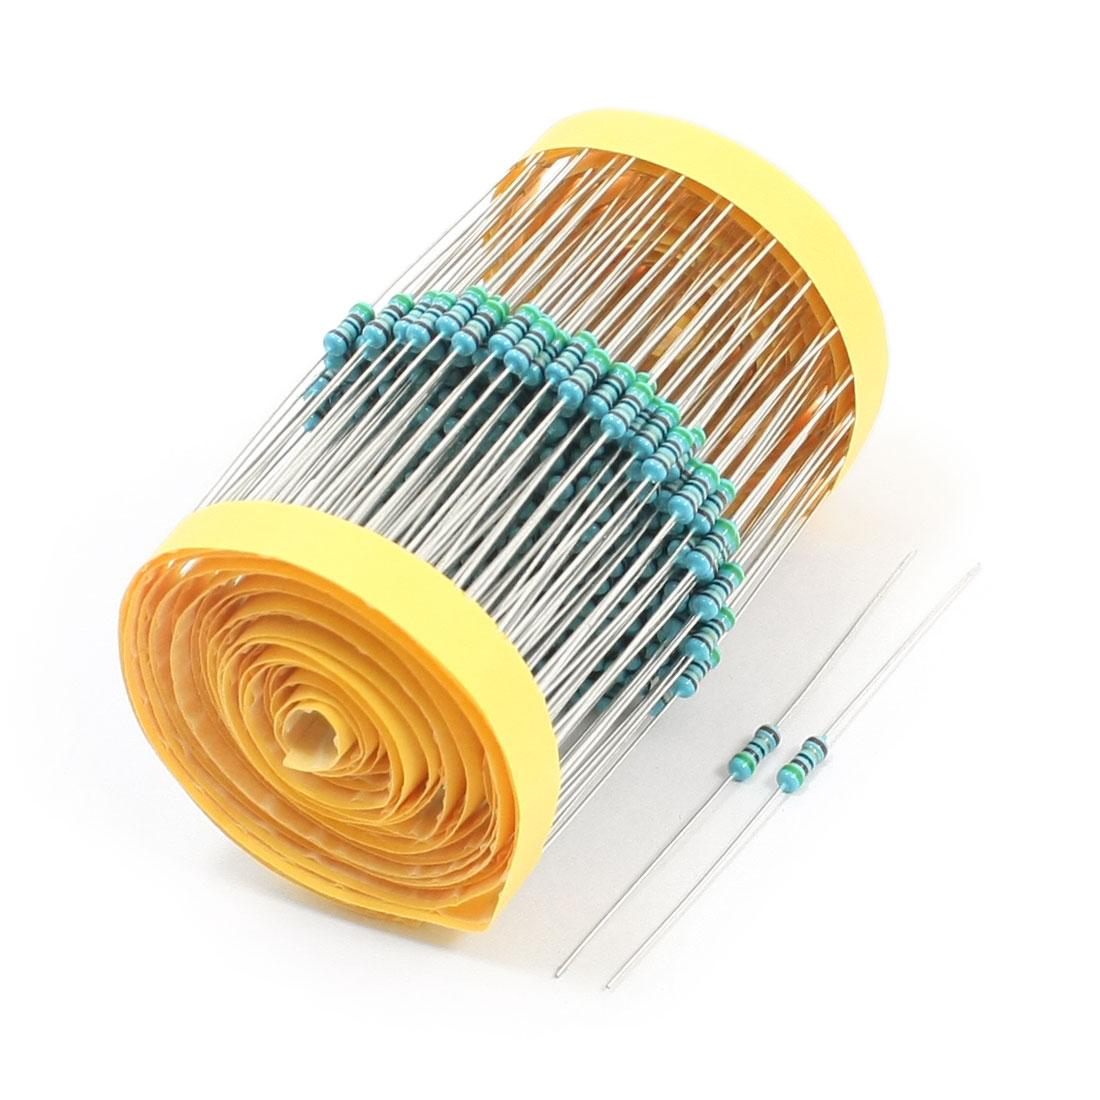 300PCS 0.25Watt 51 Ohm 1% Tolerance Axial Lead Metal Film Resistors